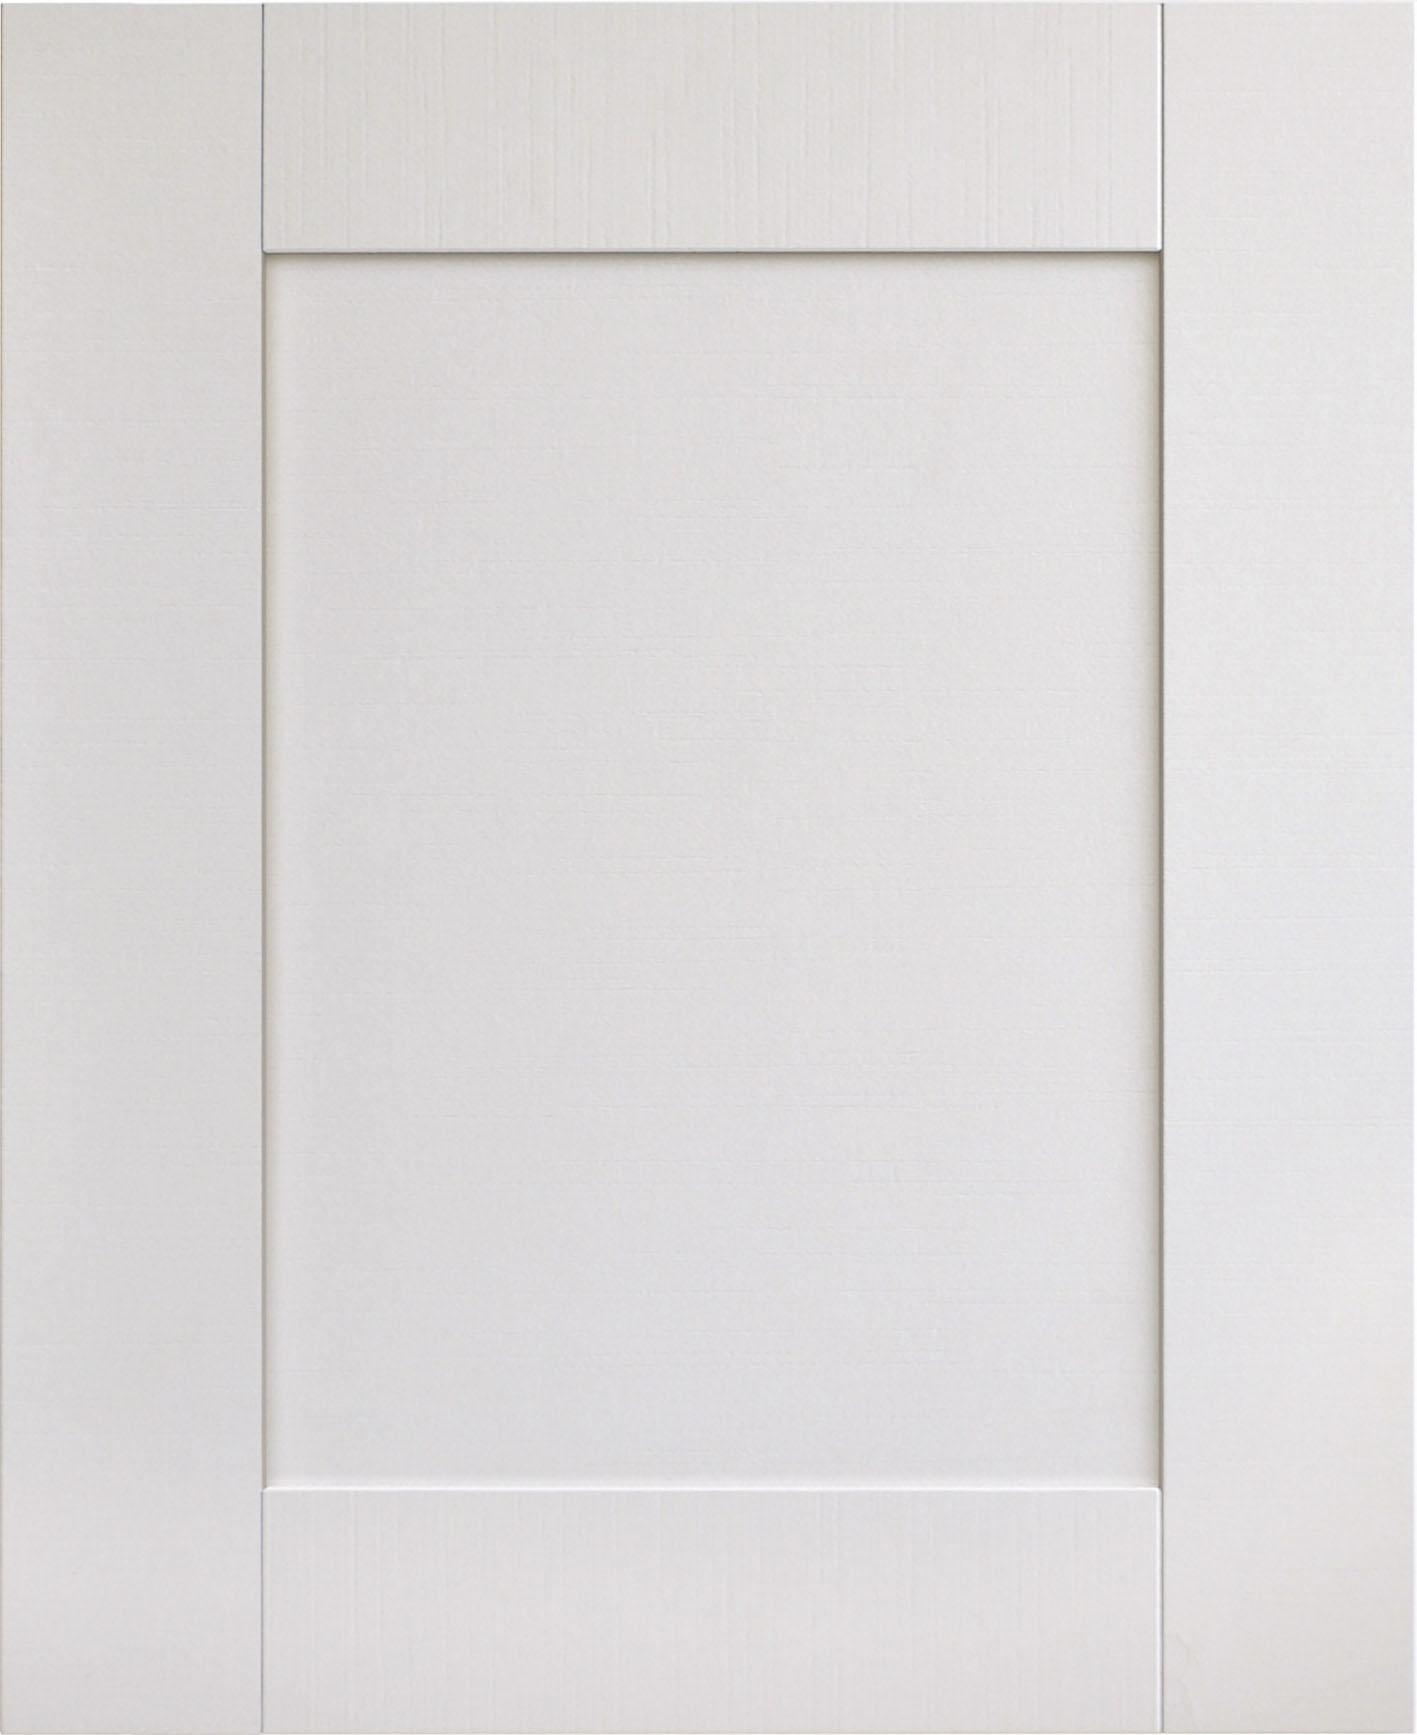 Square Frame 2341-SQ